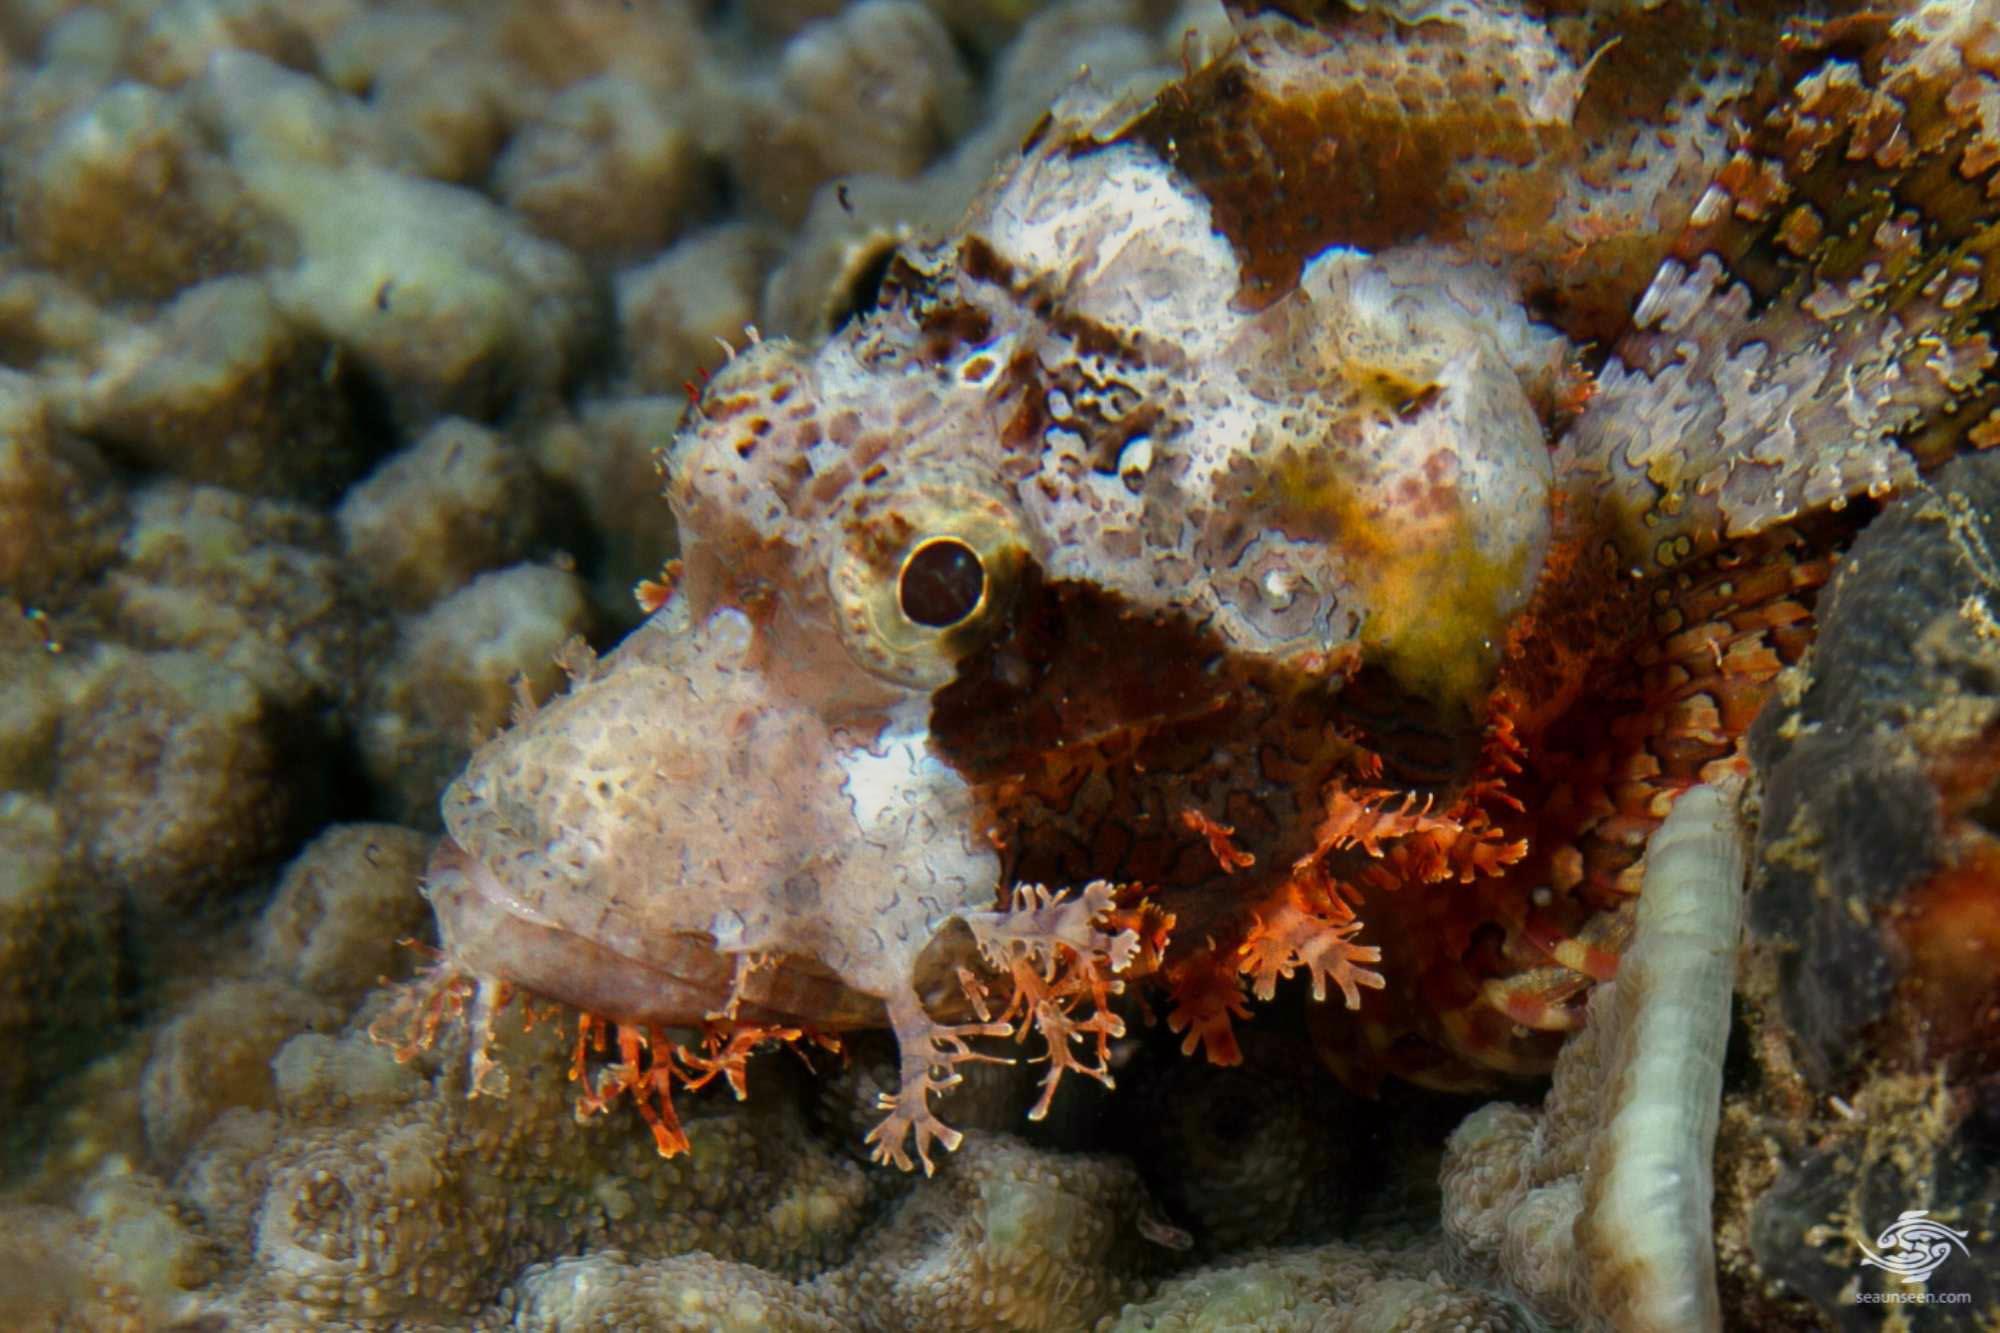 tasseled scorpionfish (Scorpaenopsis oxycephala)